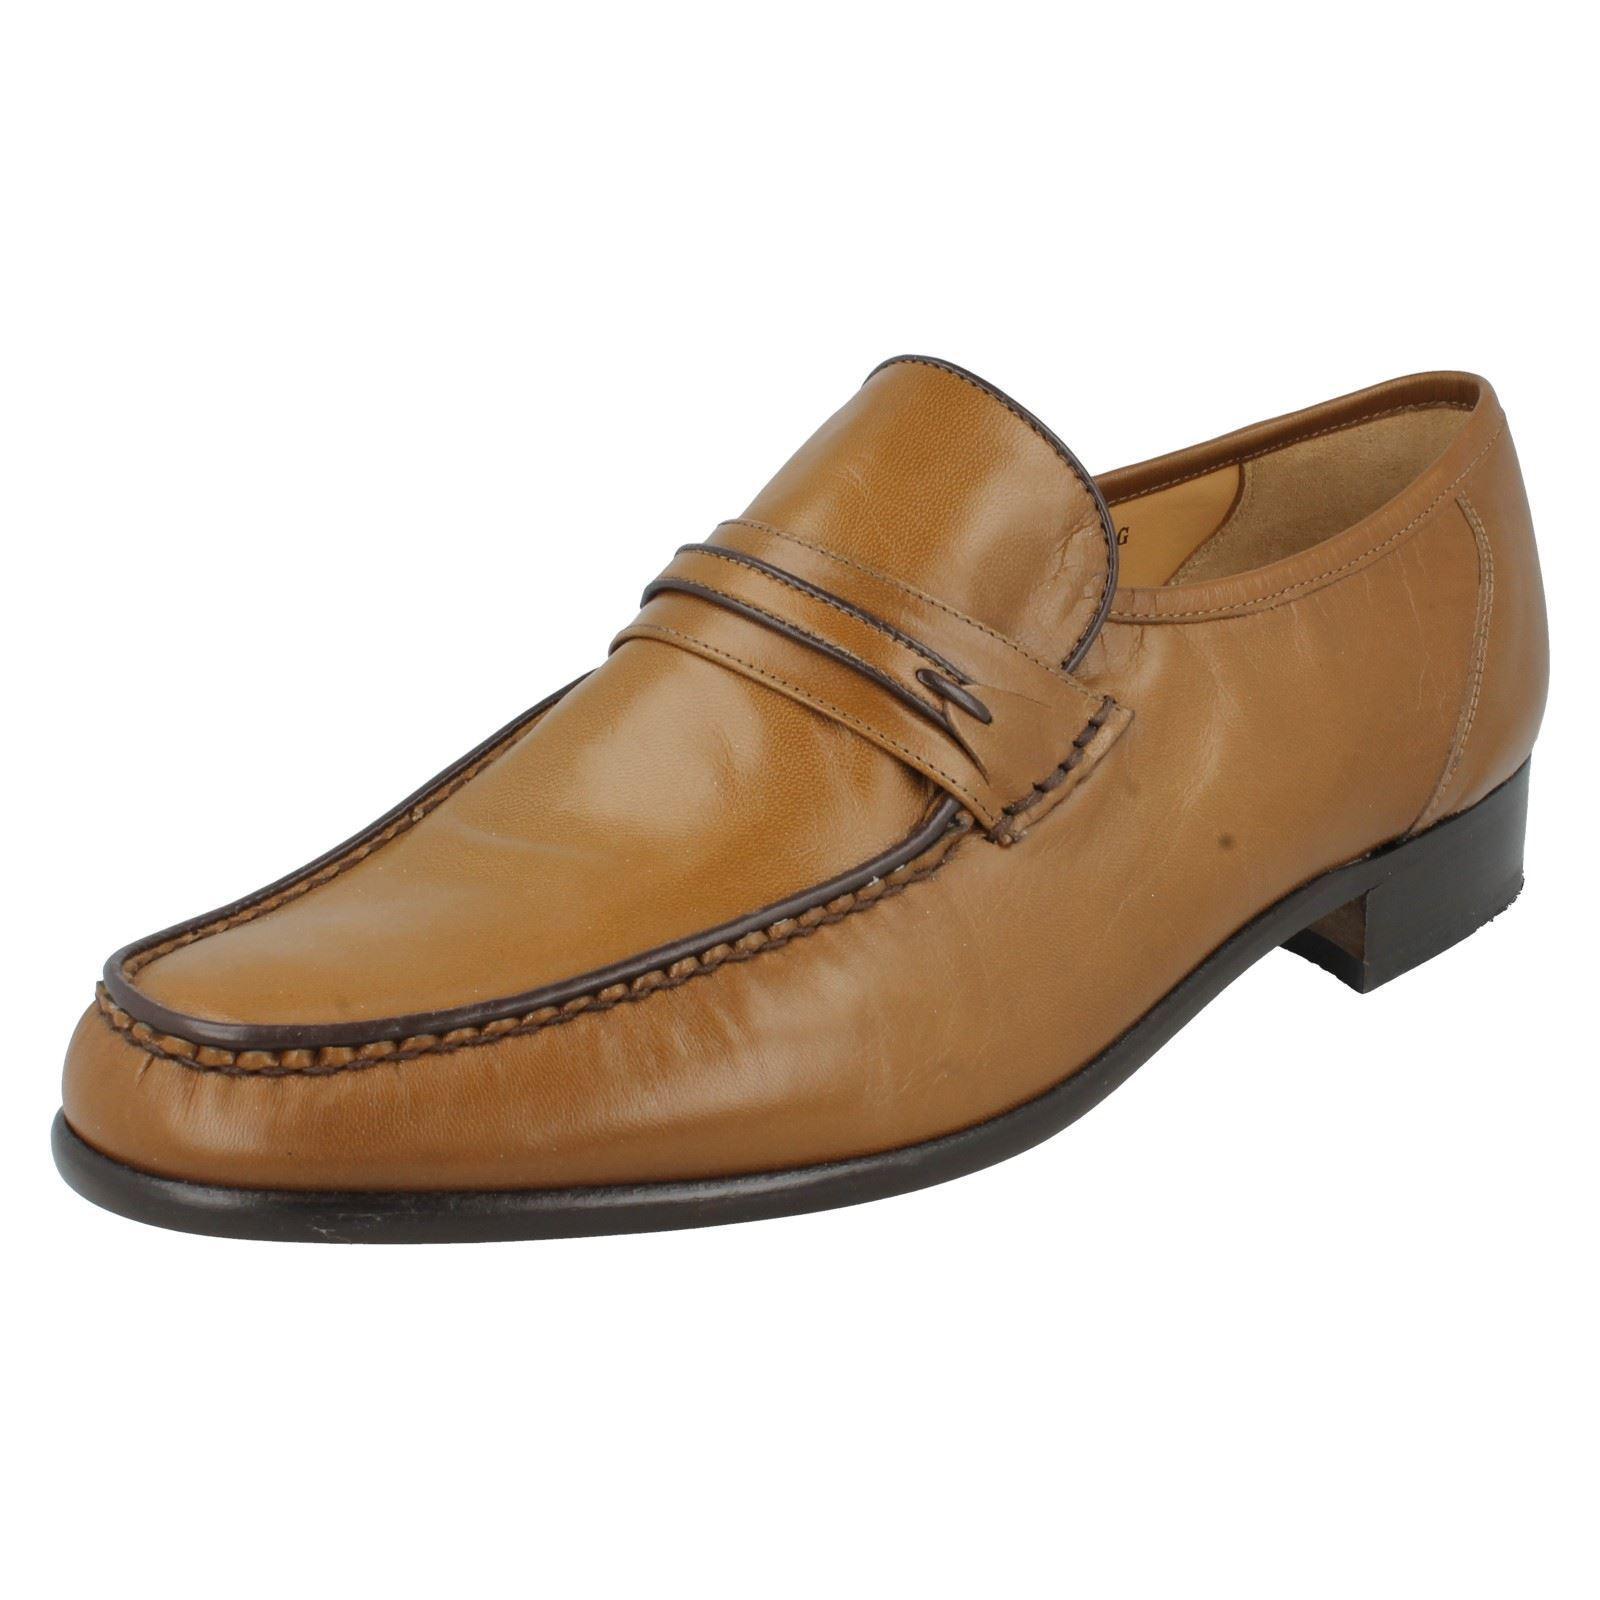 Homme Mocassin Grenson Smart à Enfiler Mocassin Homme Chaussures Albany 7d326f